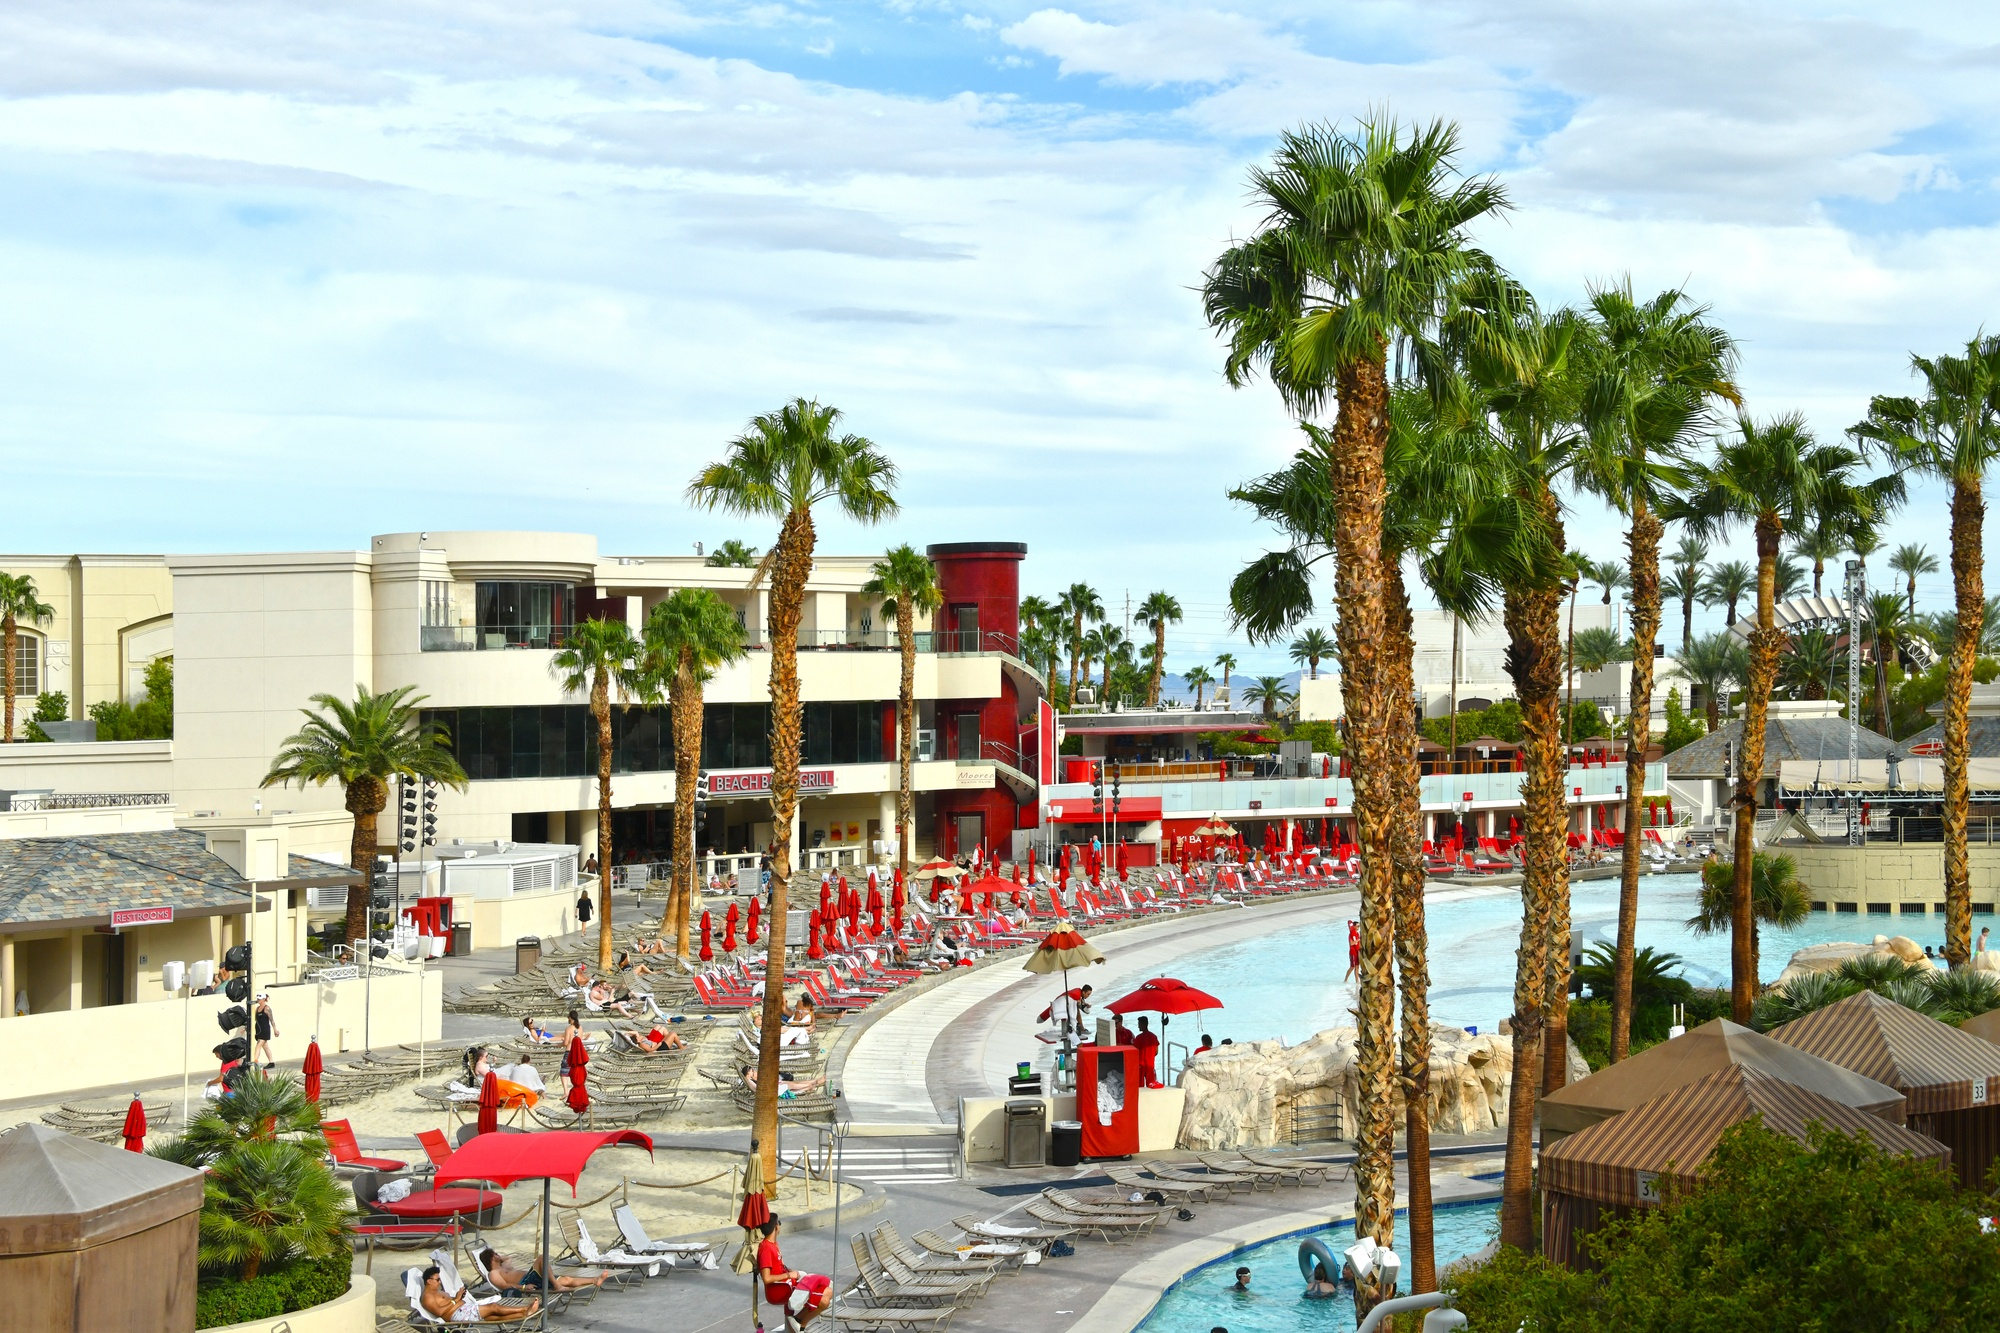 Mandalay Bay Beach pools in Las Vegas